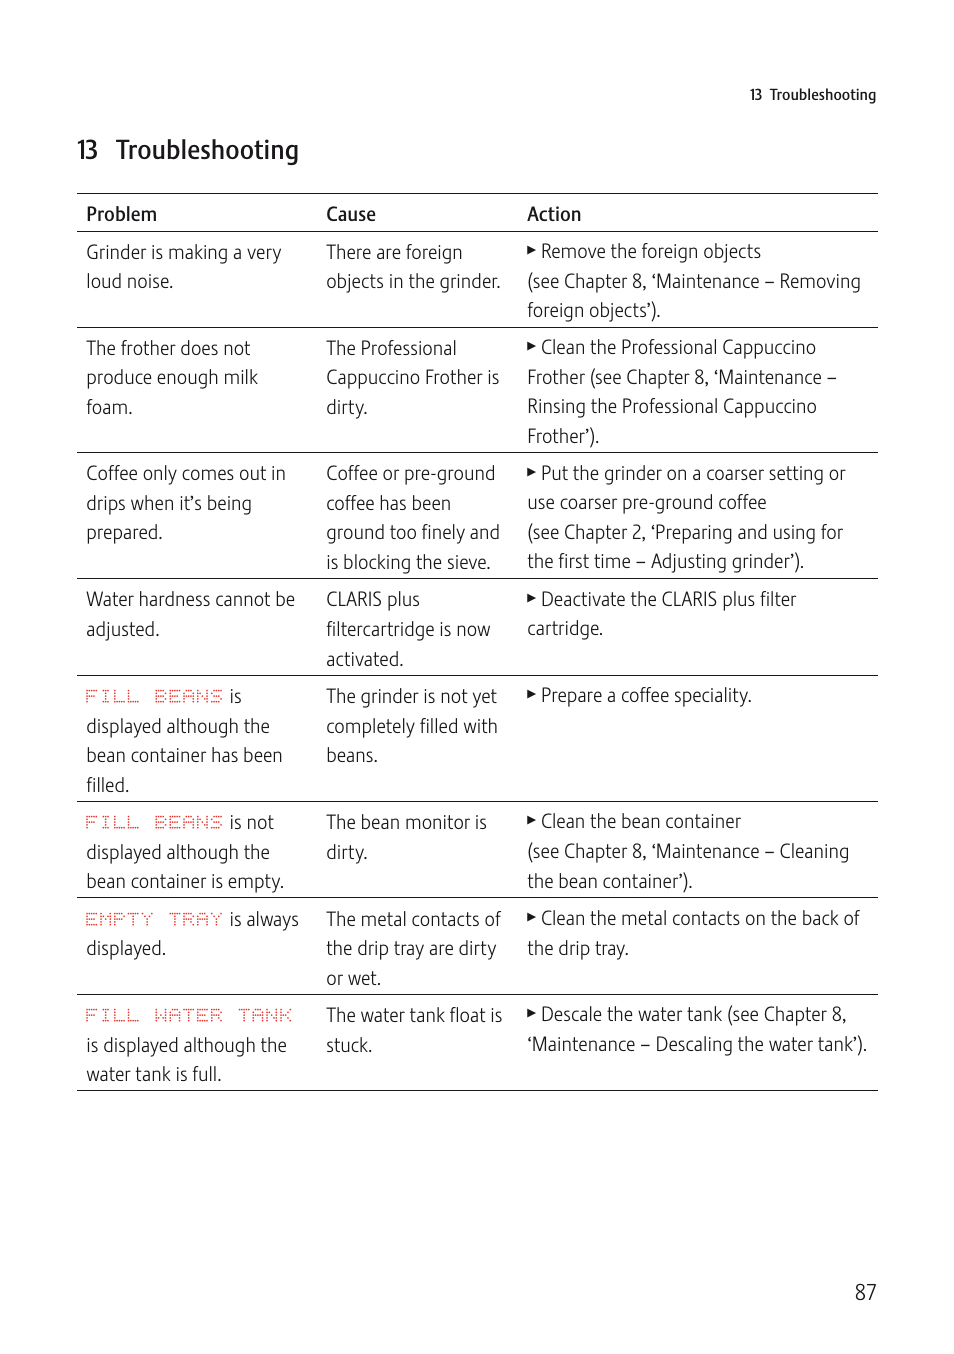 13 Troubleshooting Jura Capresso Impressa J5 User Manual Page 87 104